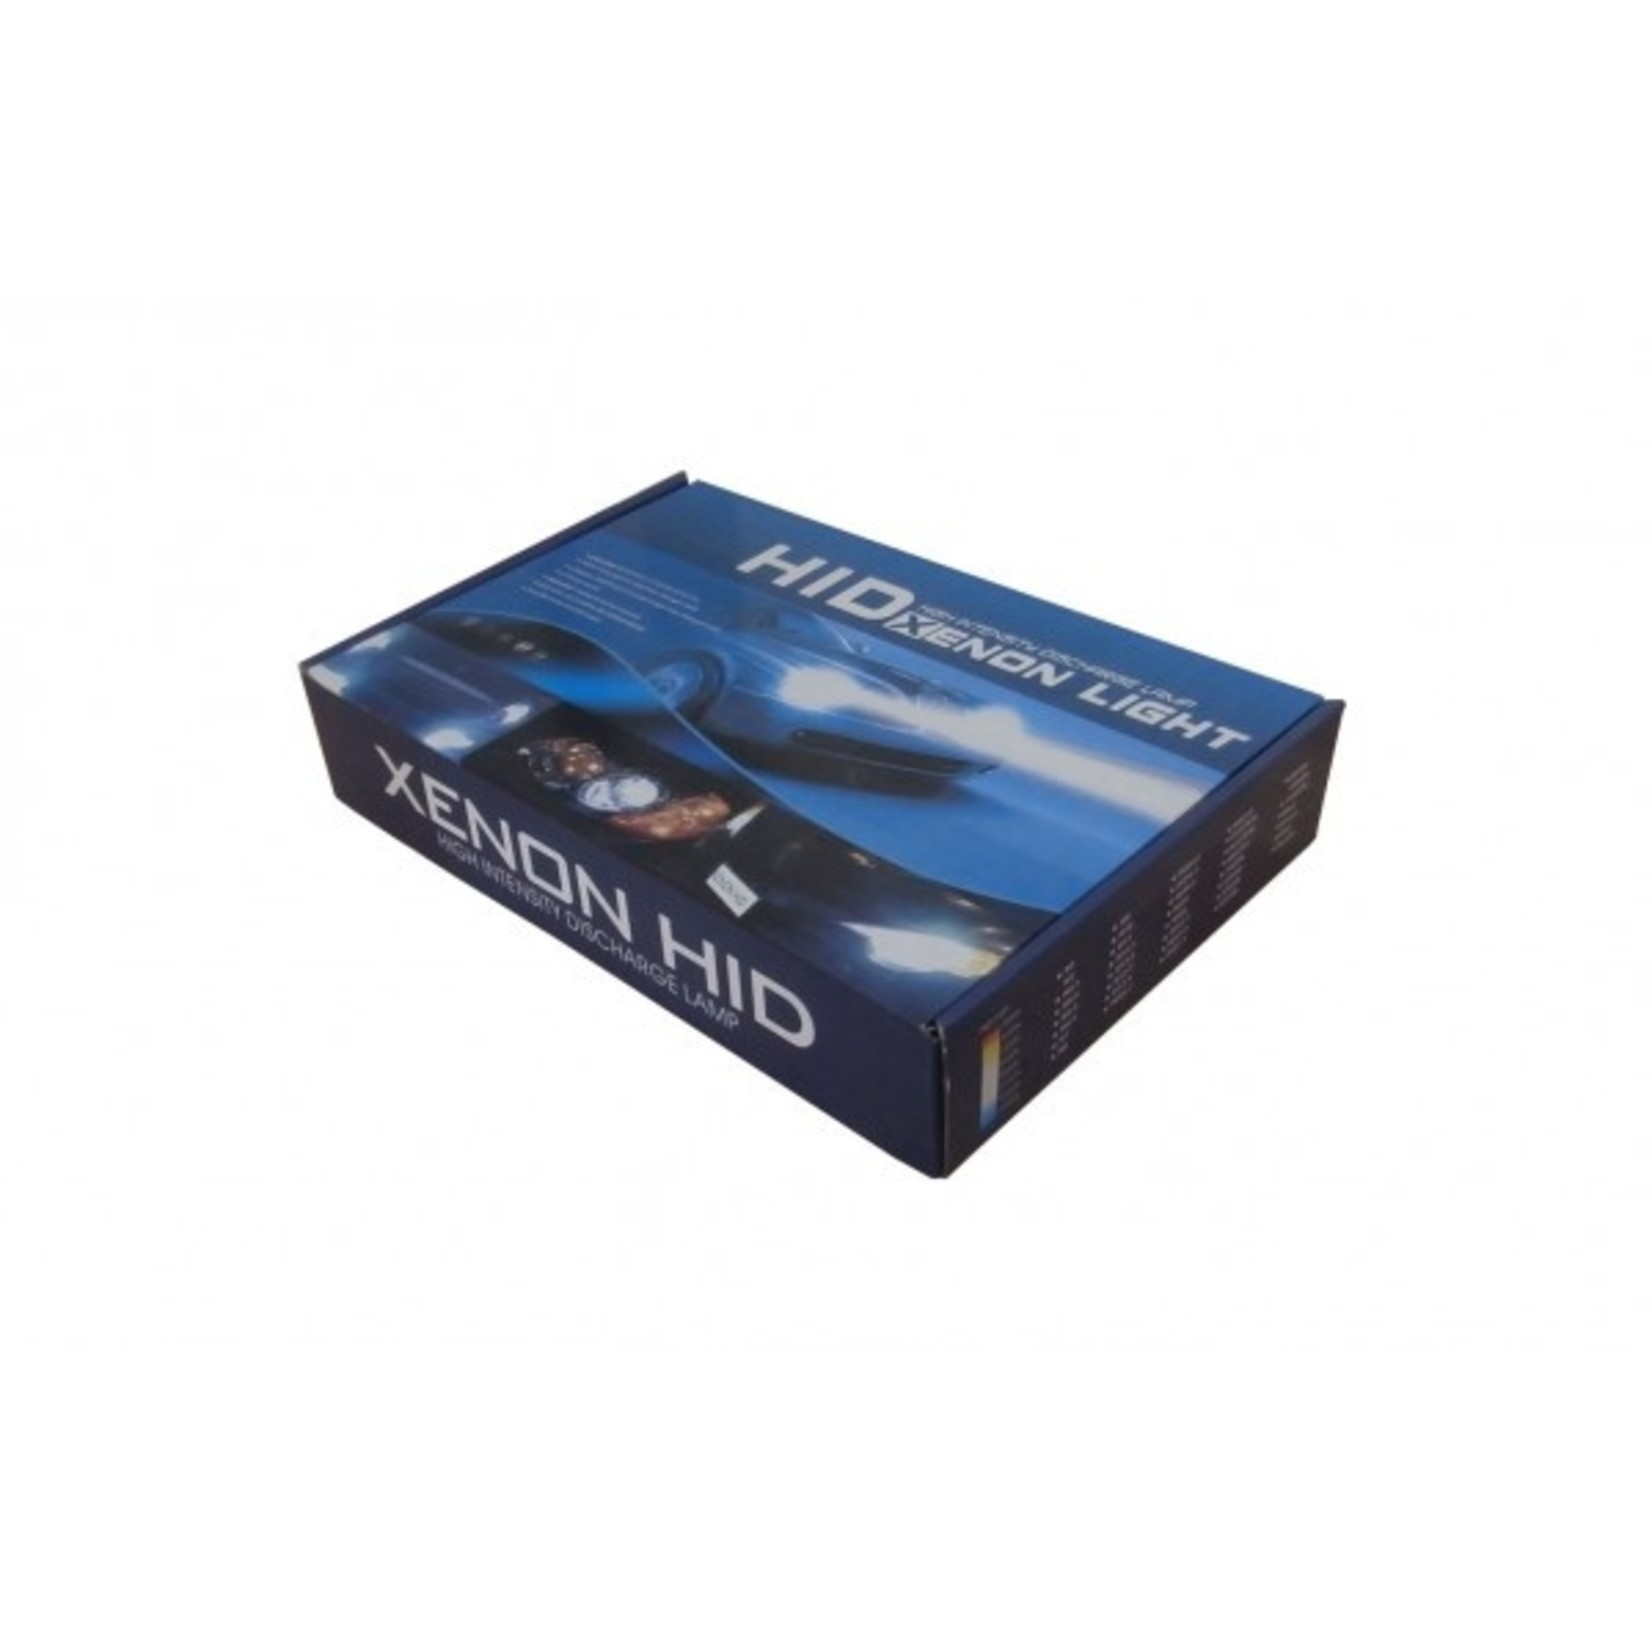 XEOD H11 motor Xenon set